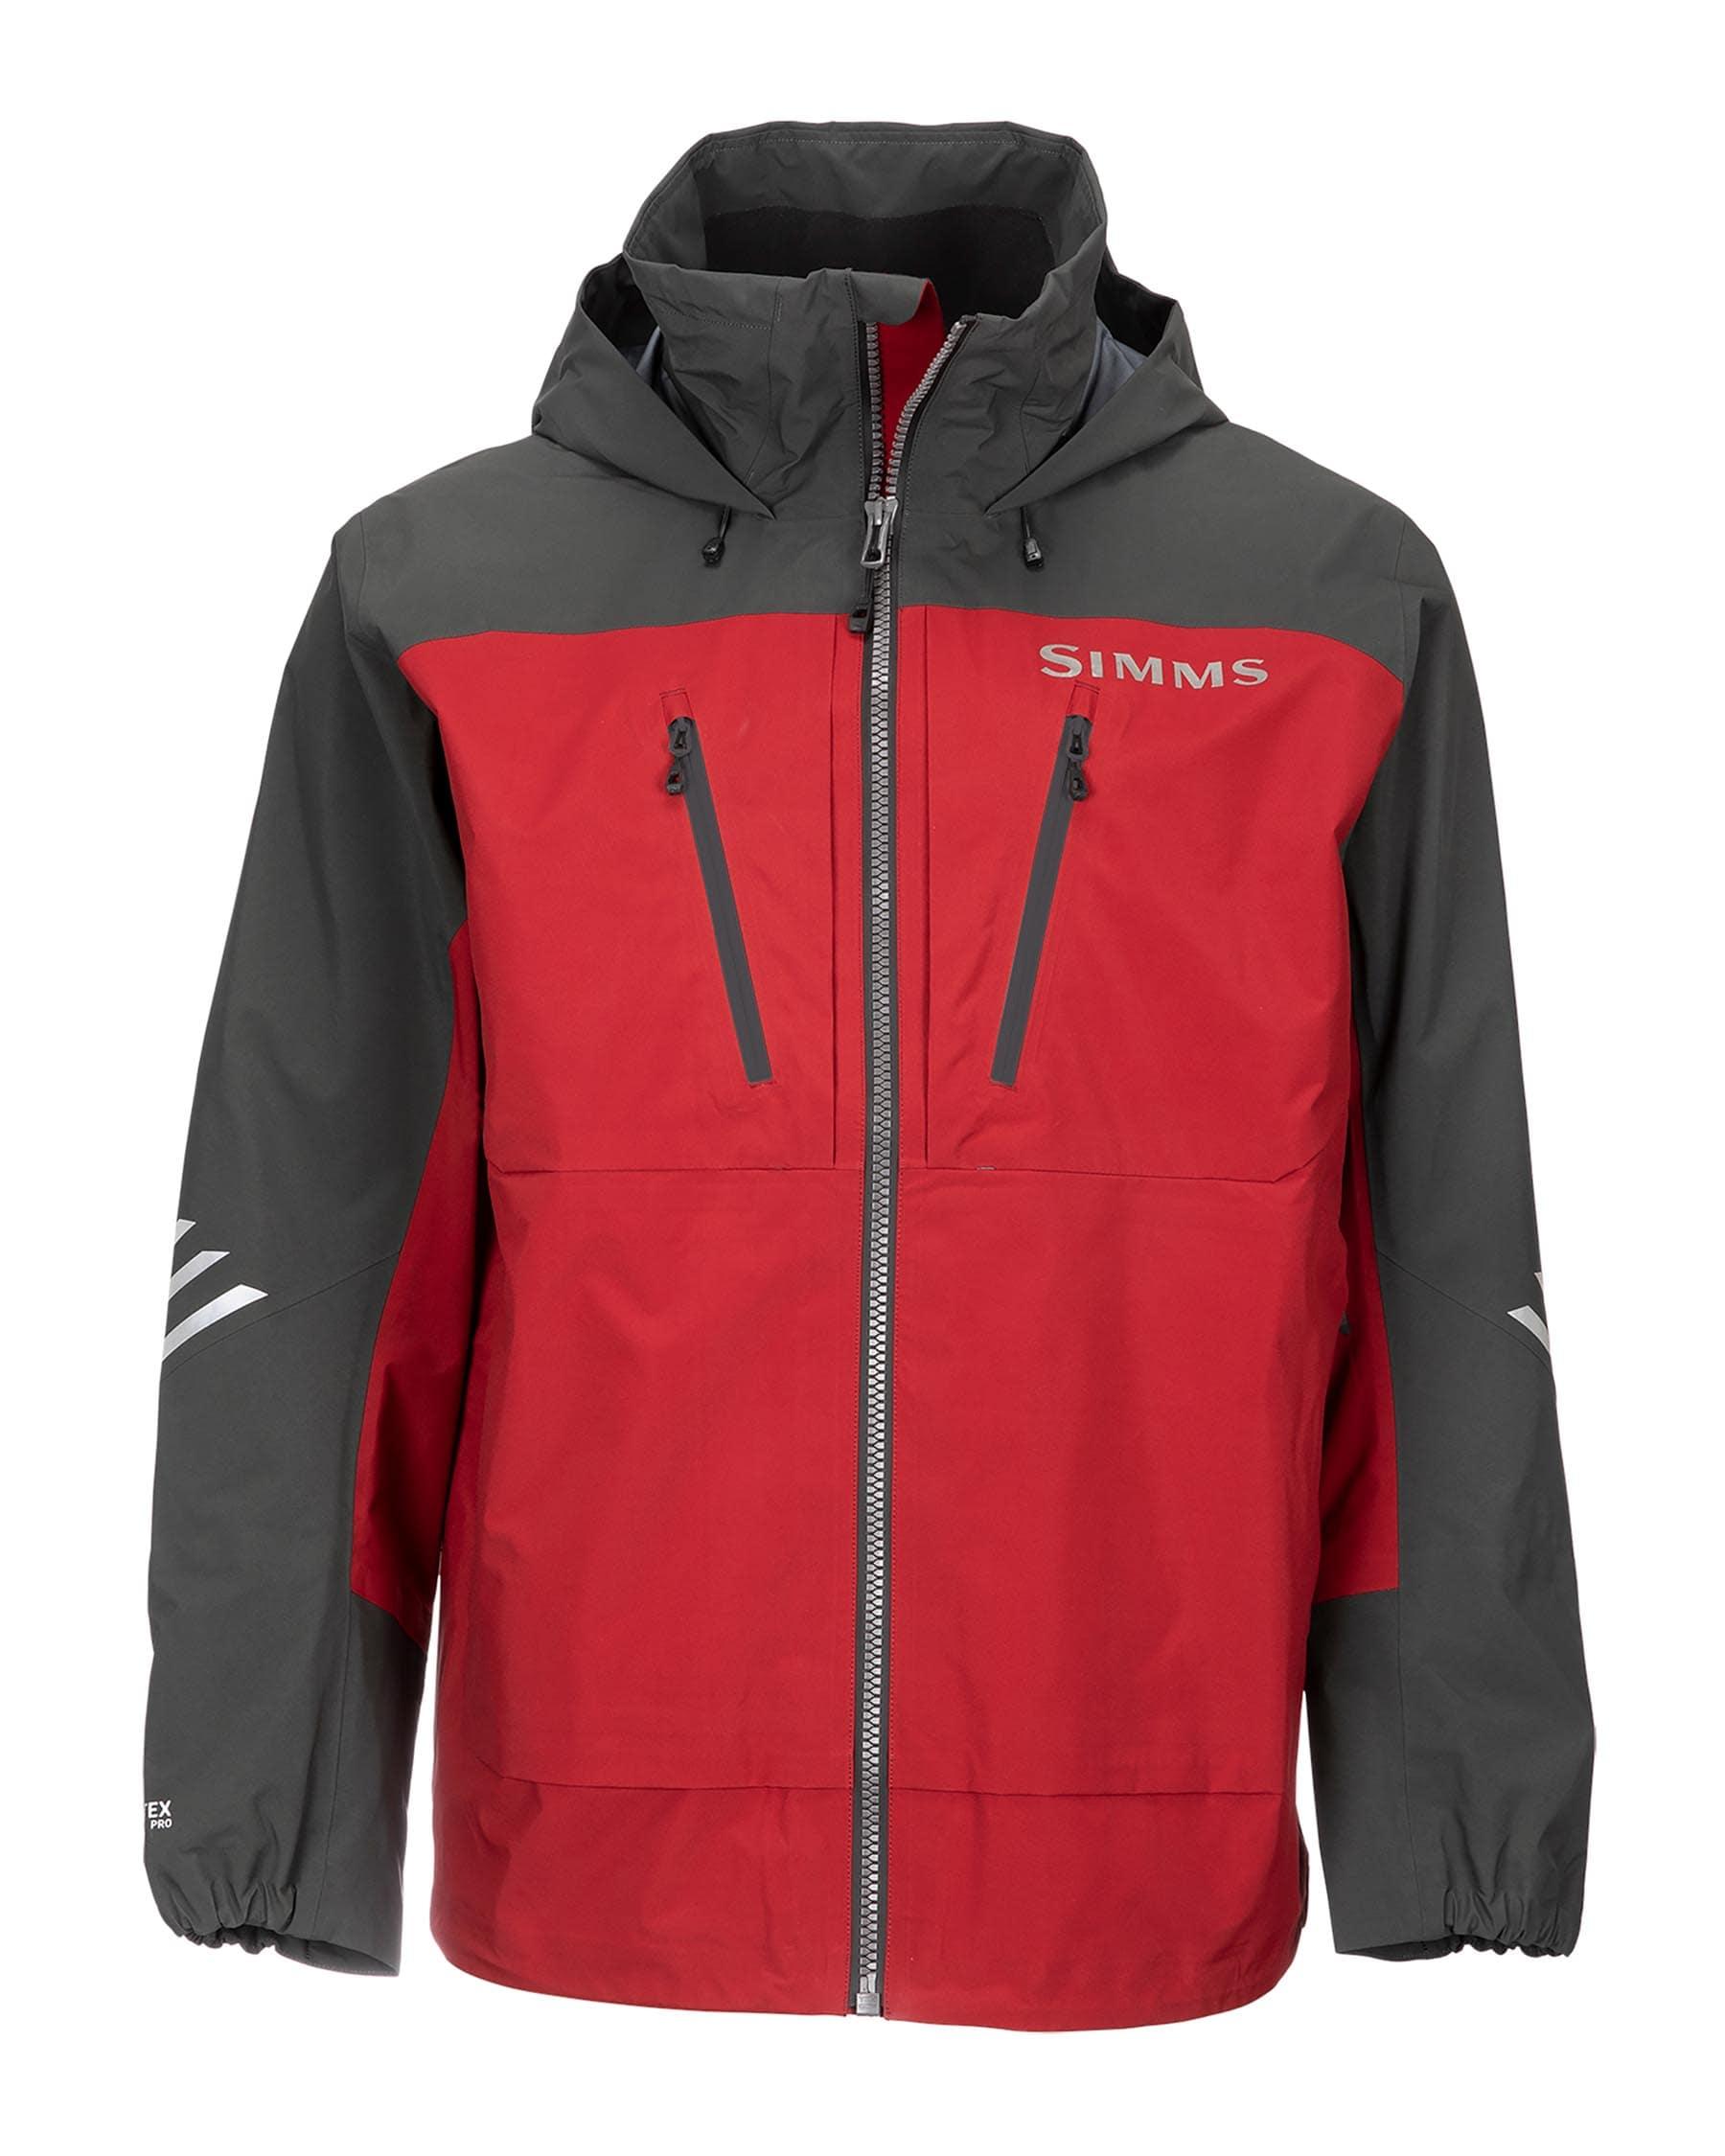 simms-prodry-jacket-2021-chubasquero